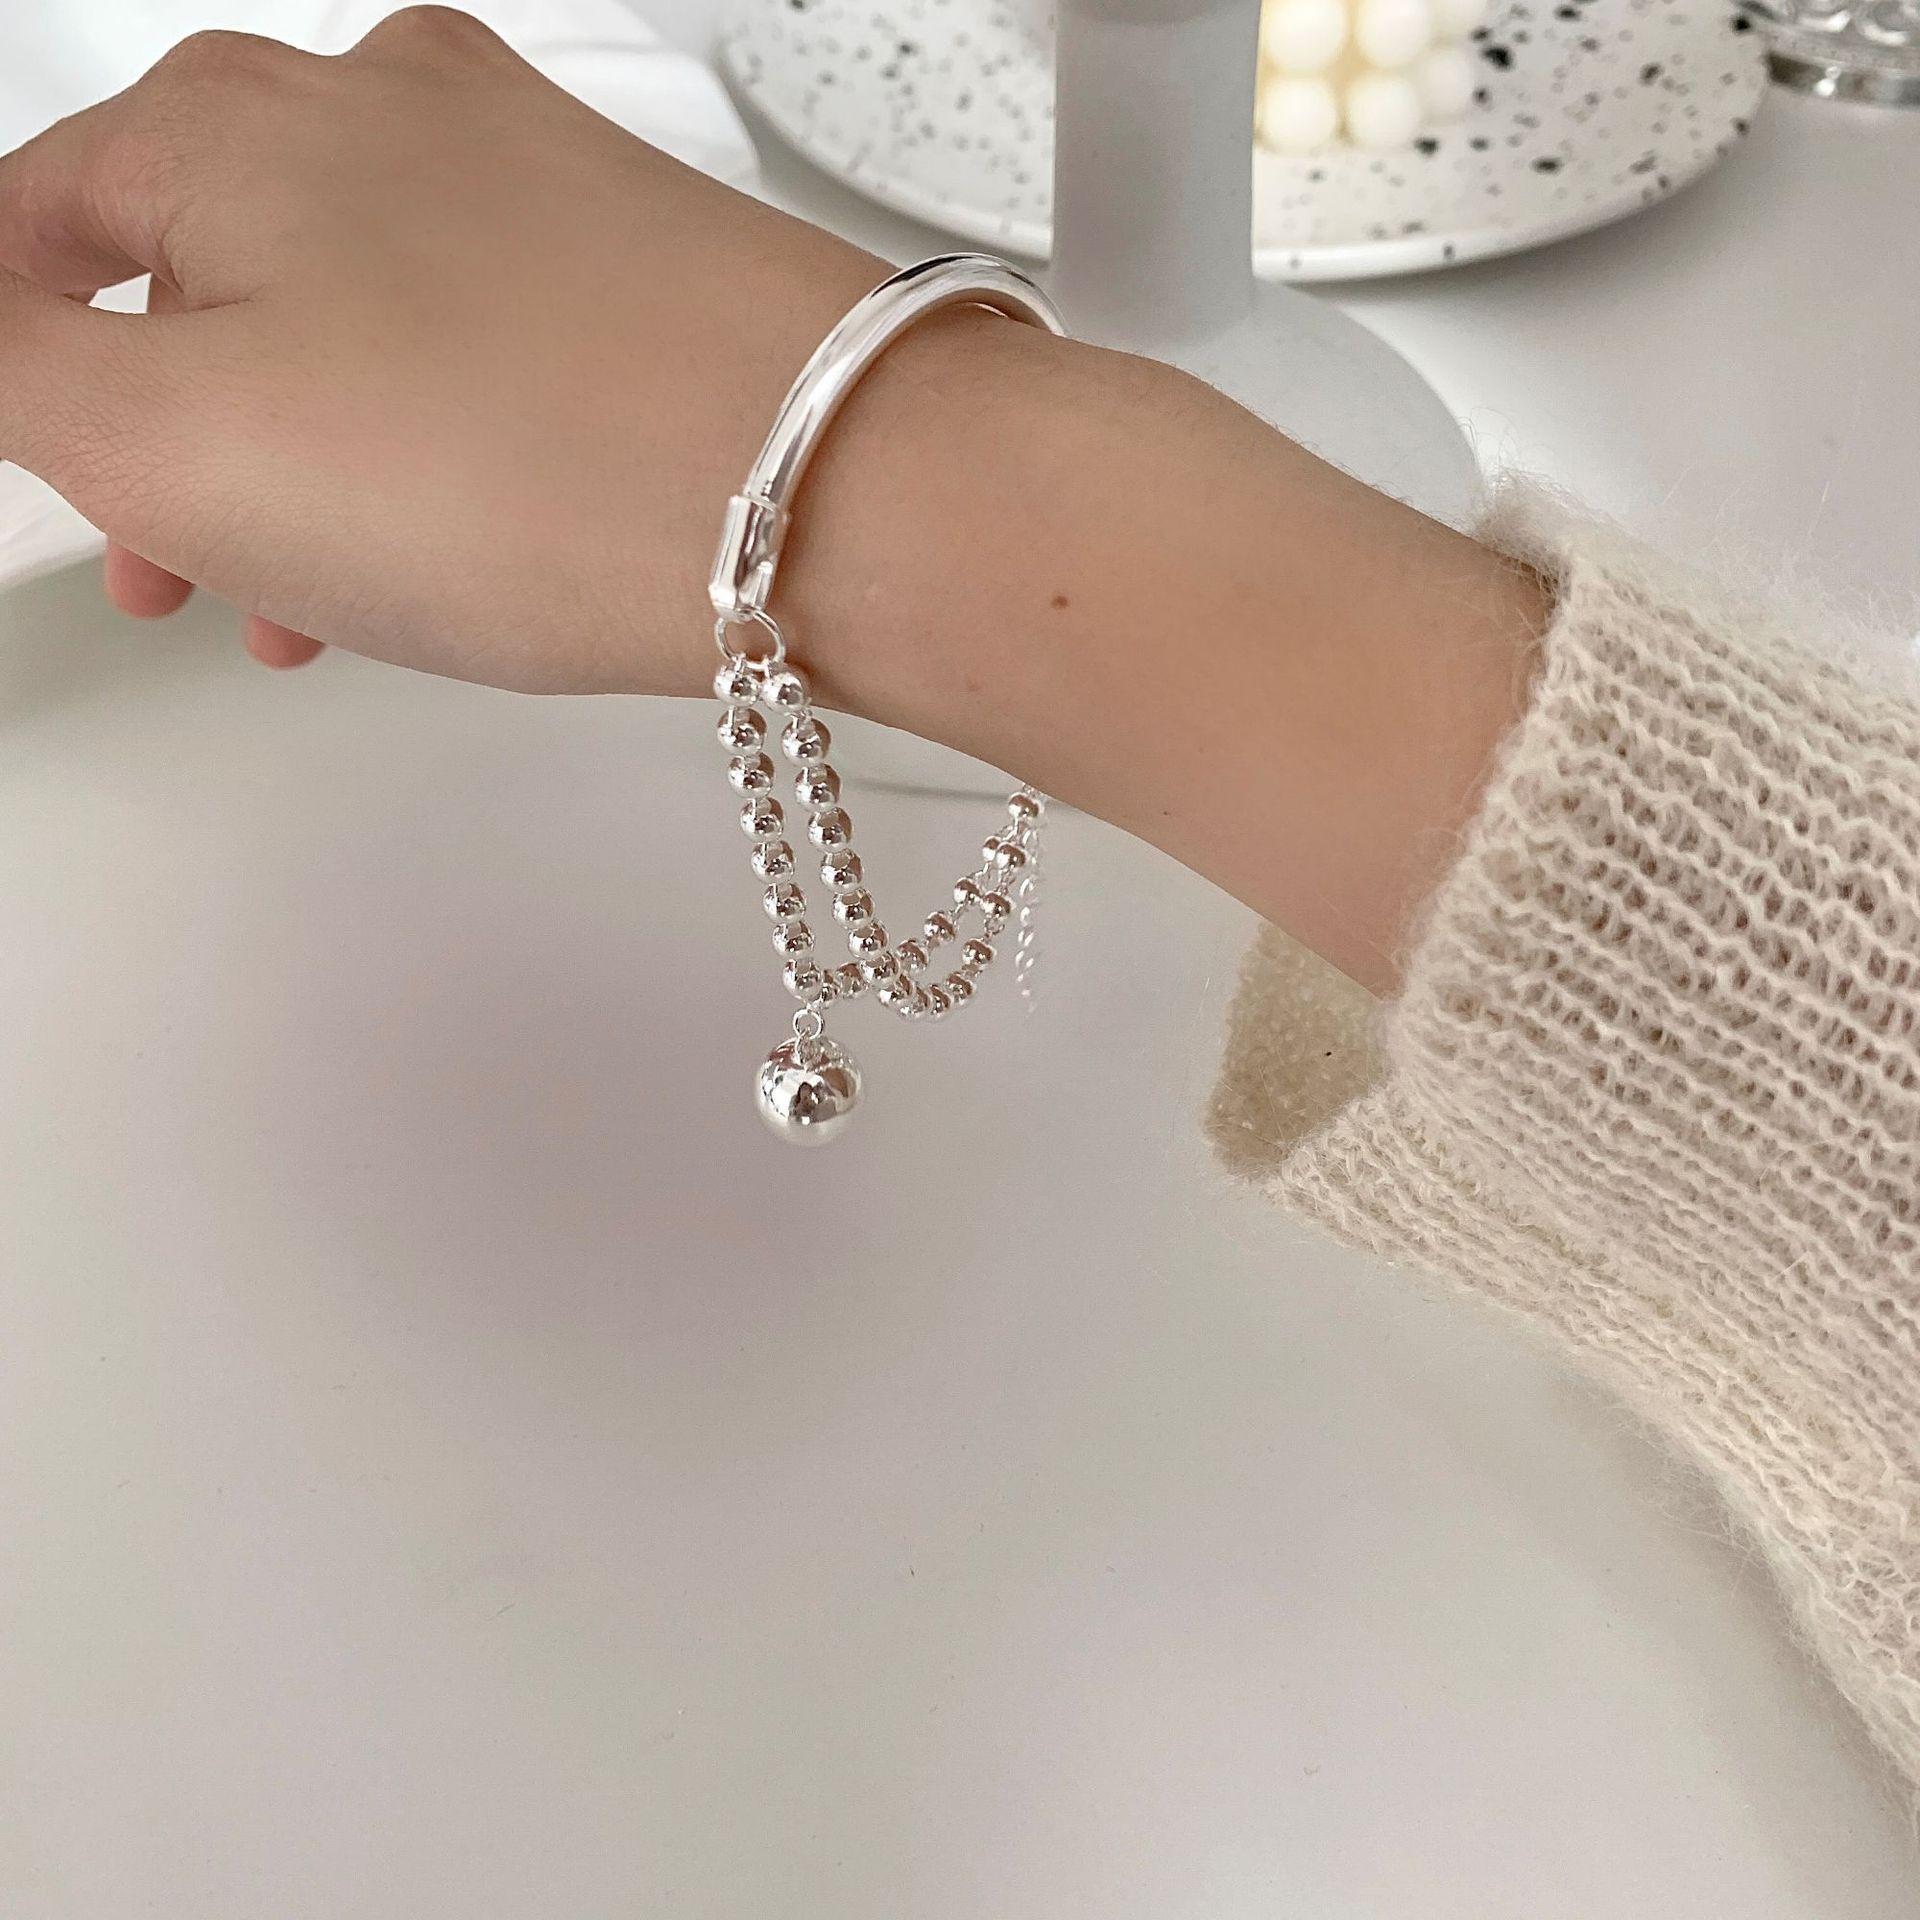 S925 Sterling Silver Bracelet For Women Korean Ball Bracelet Simple Student Bracelet Jewelry Wholesale